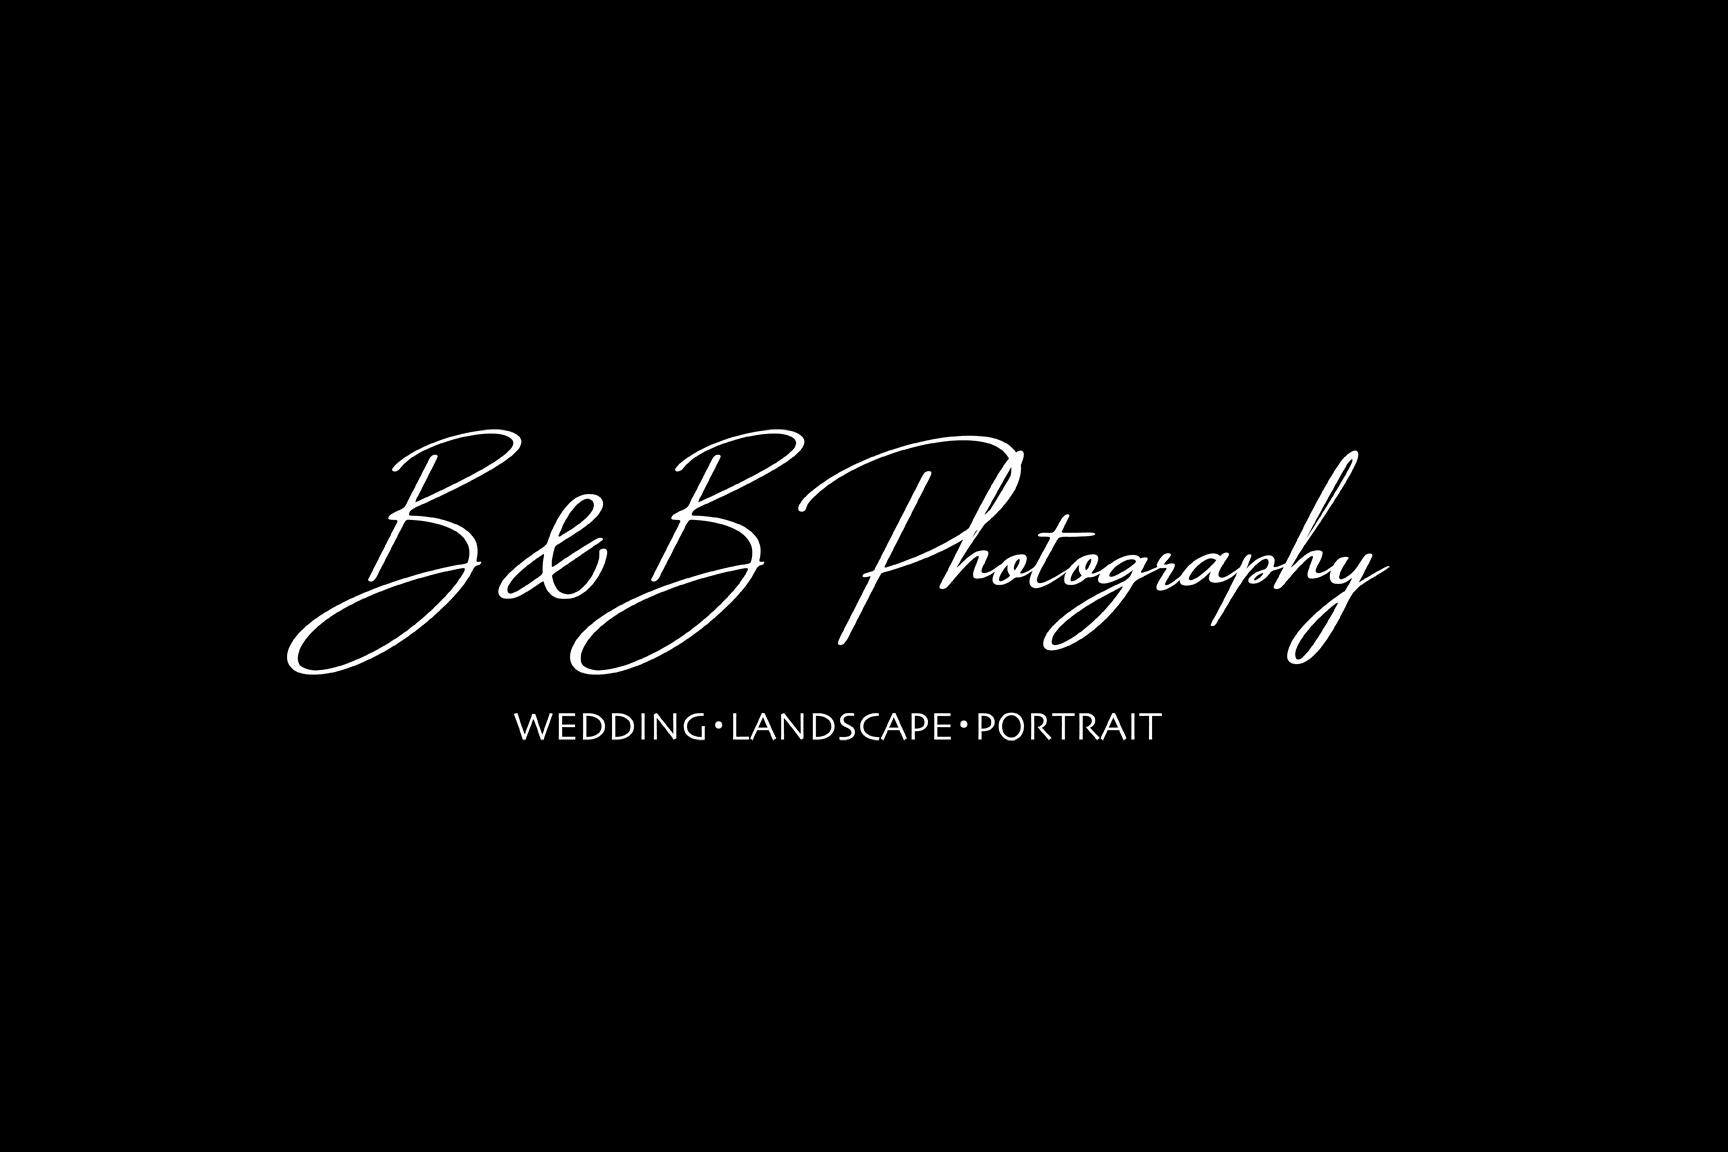 B&B Photography